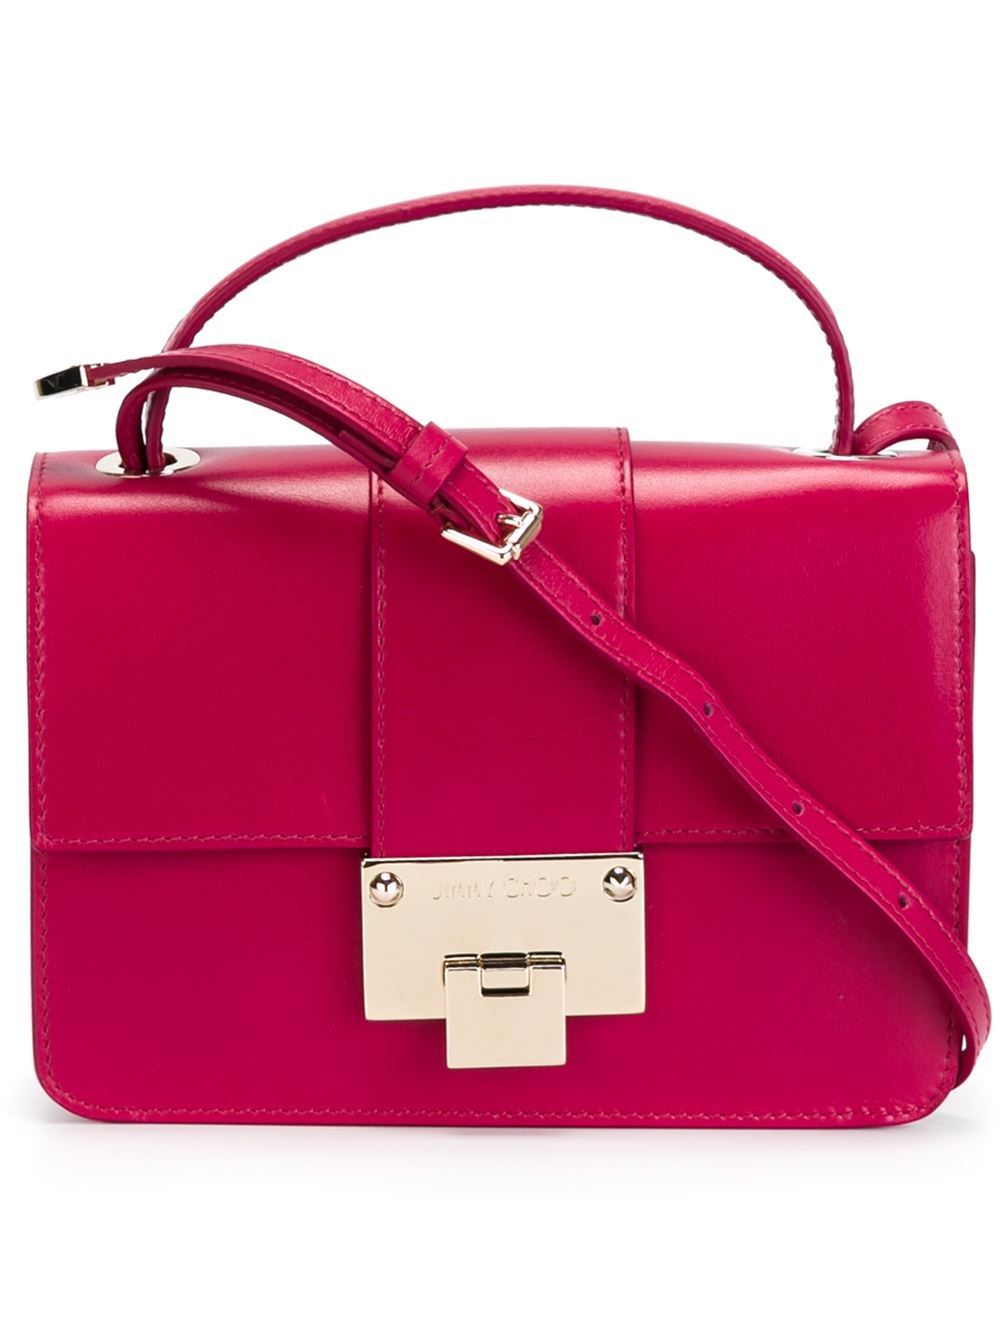 291f3c04bbf Jimmy Choo 'Rebel' Cross Body Bag in Pink - Lyst